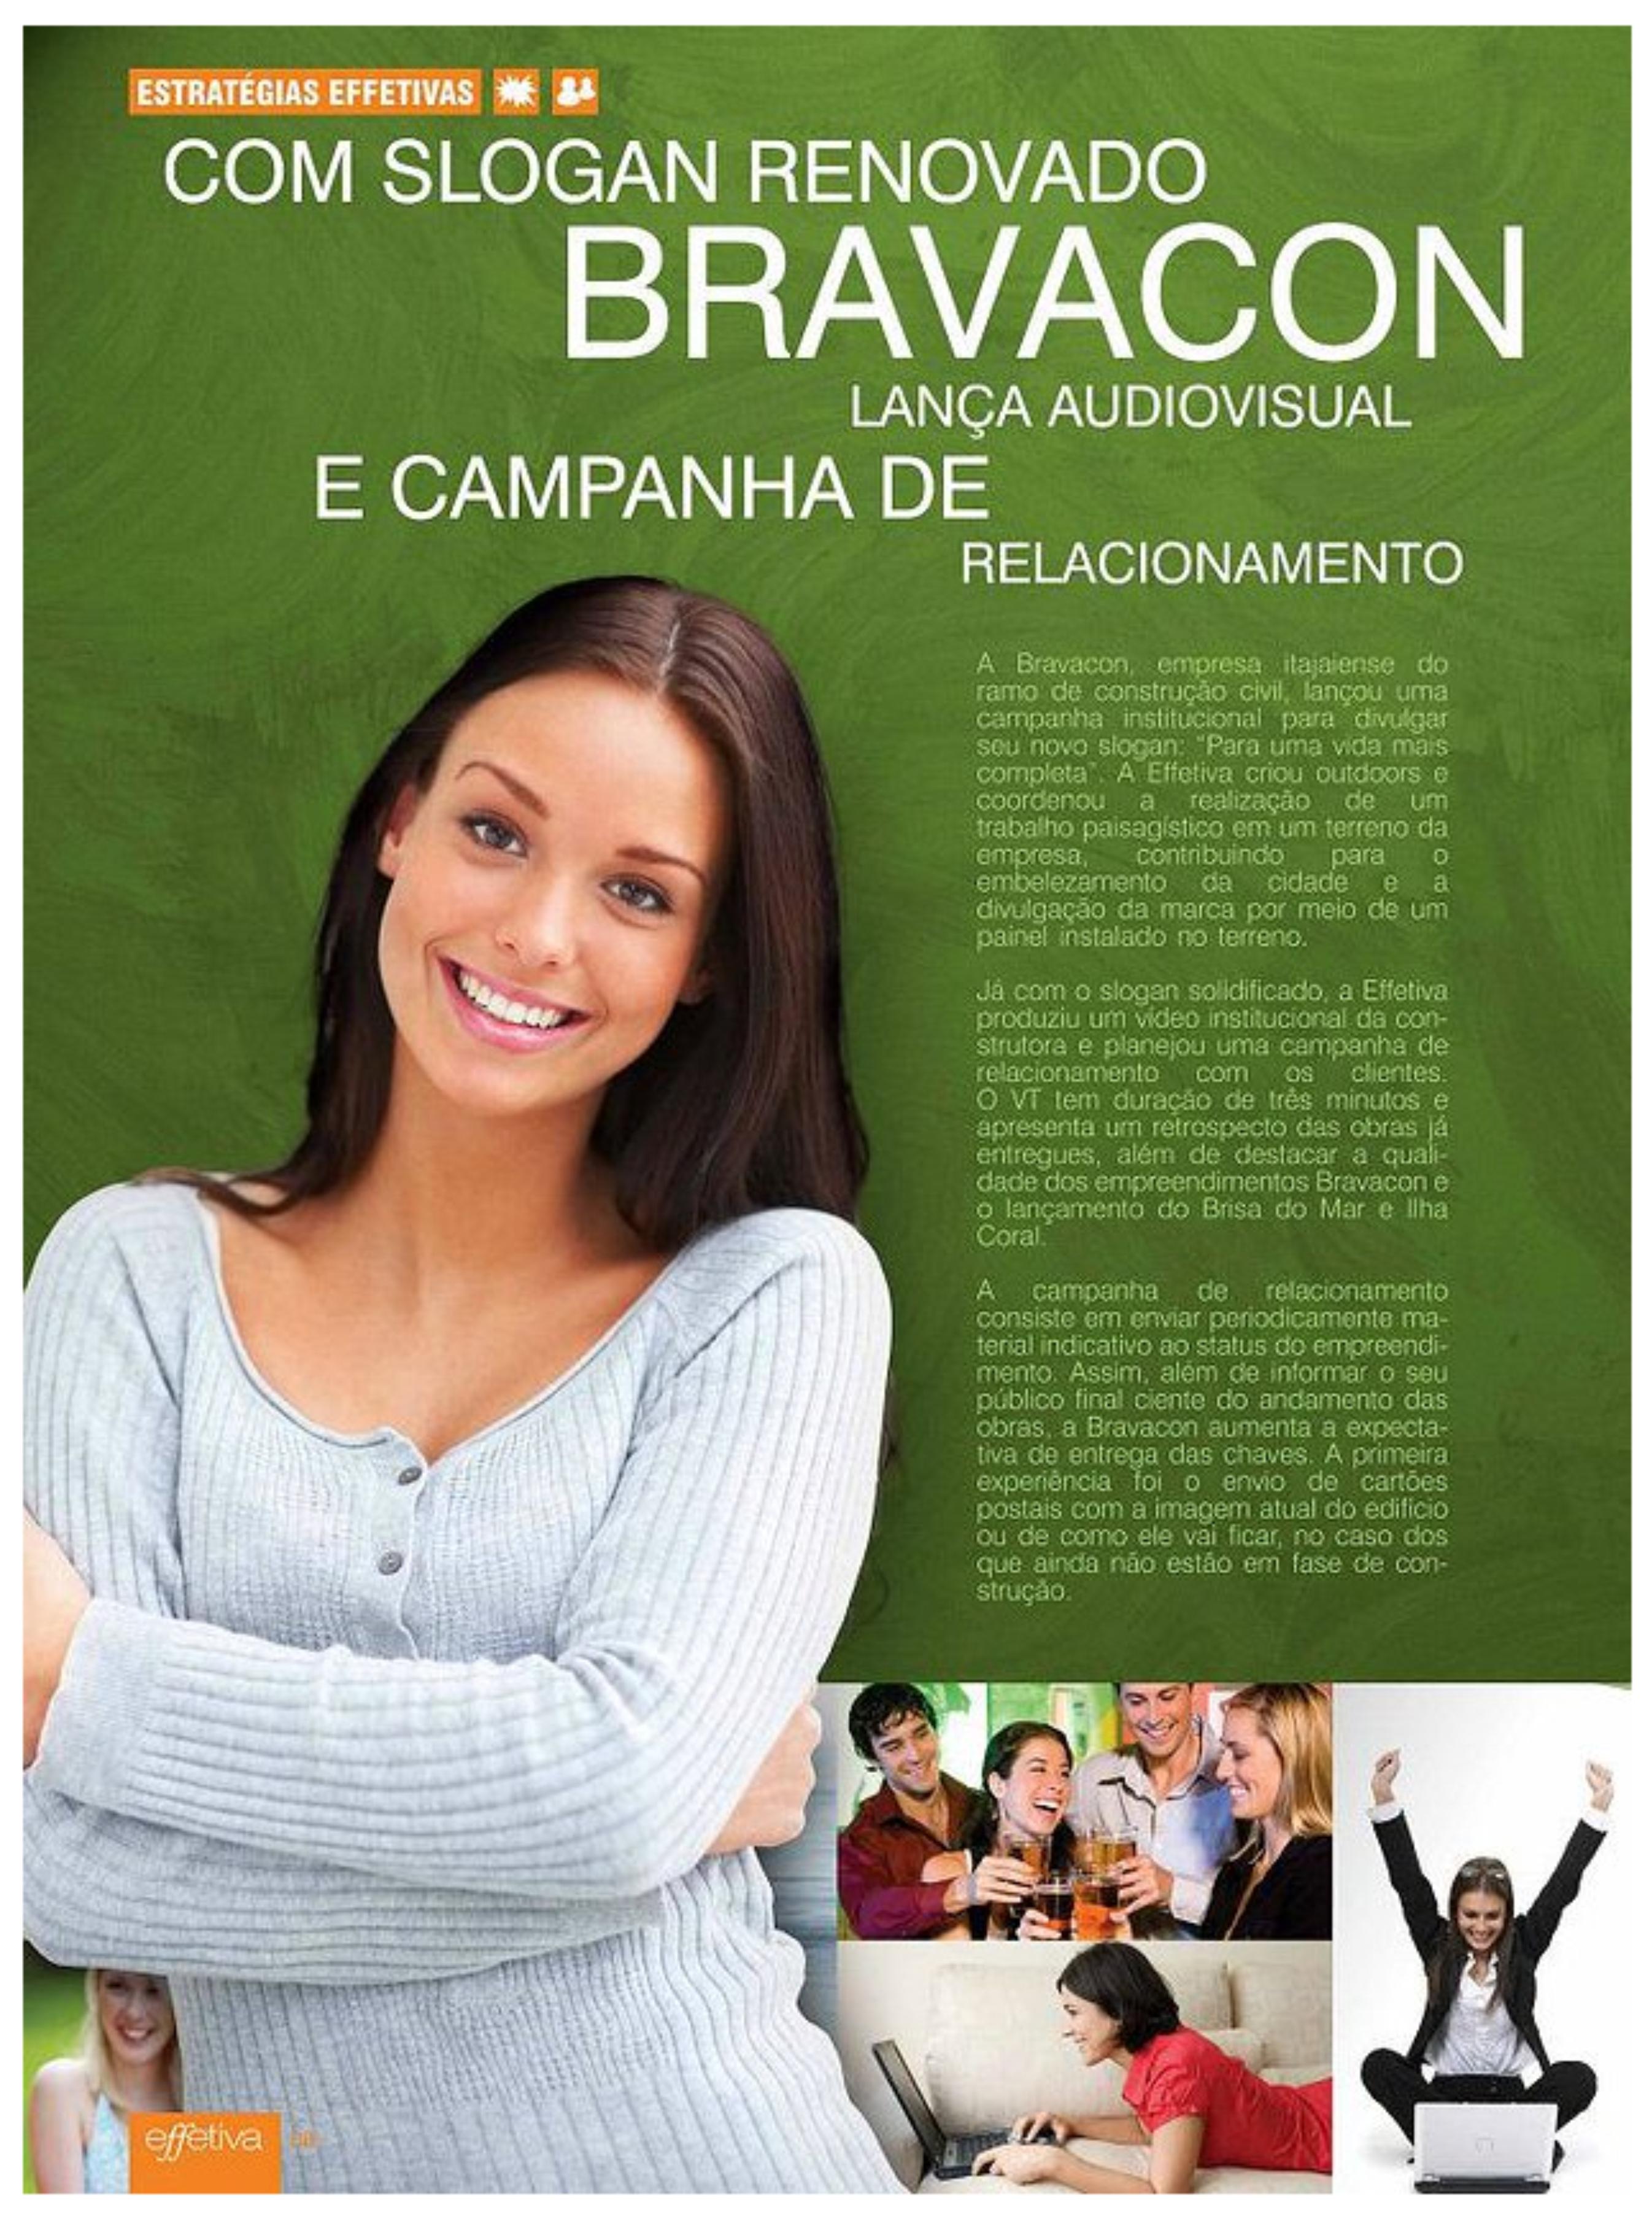 Case Bravacon